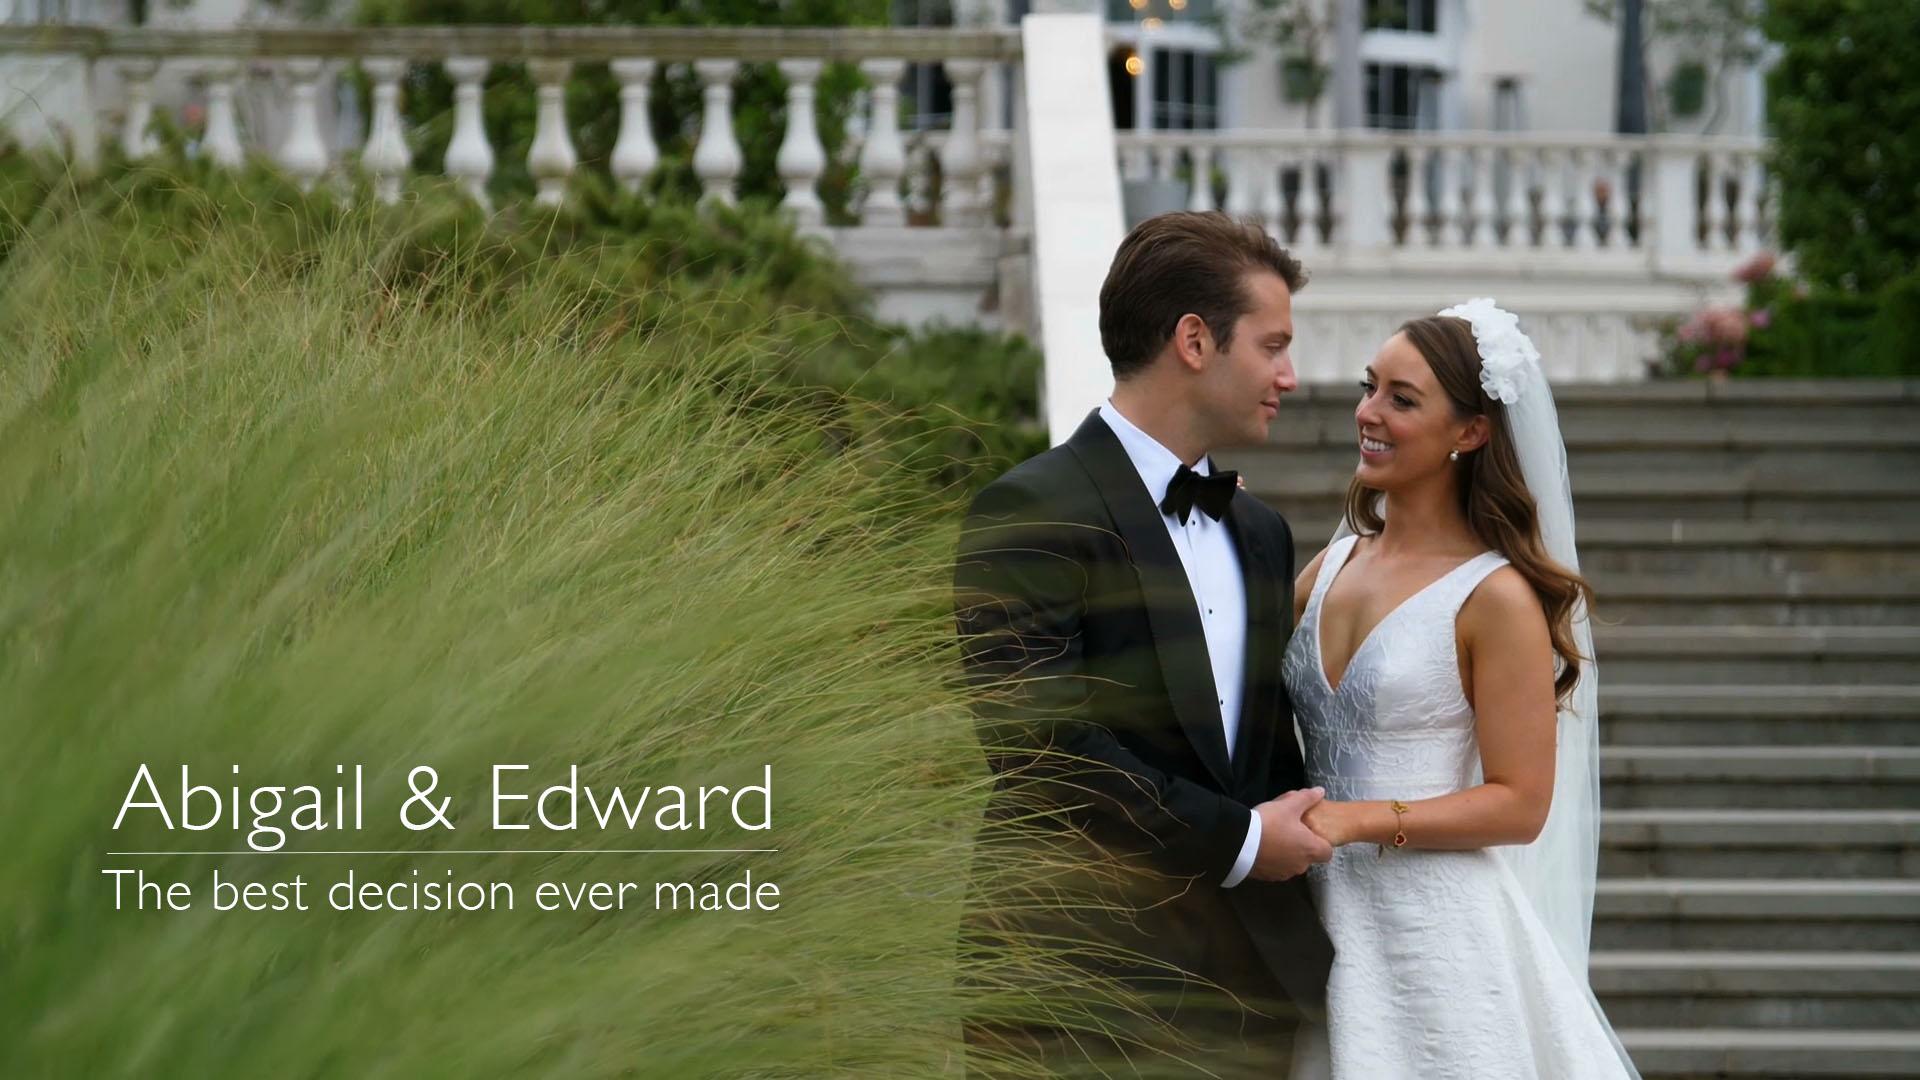 Abigail + Edward | Ascot, United Kingdom | Coworth park Hotel